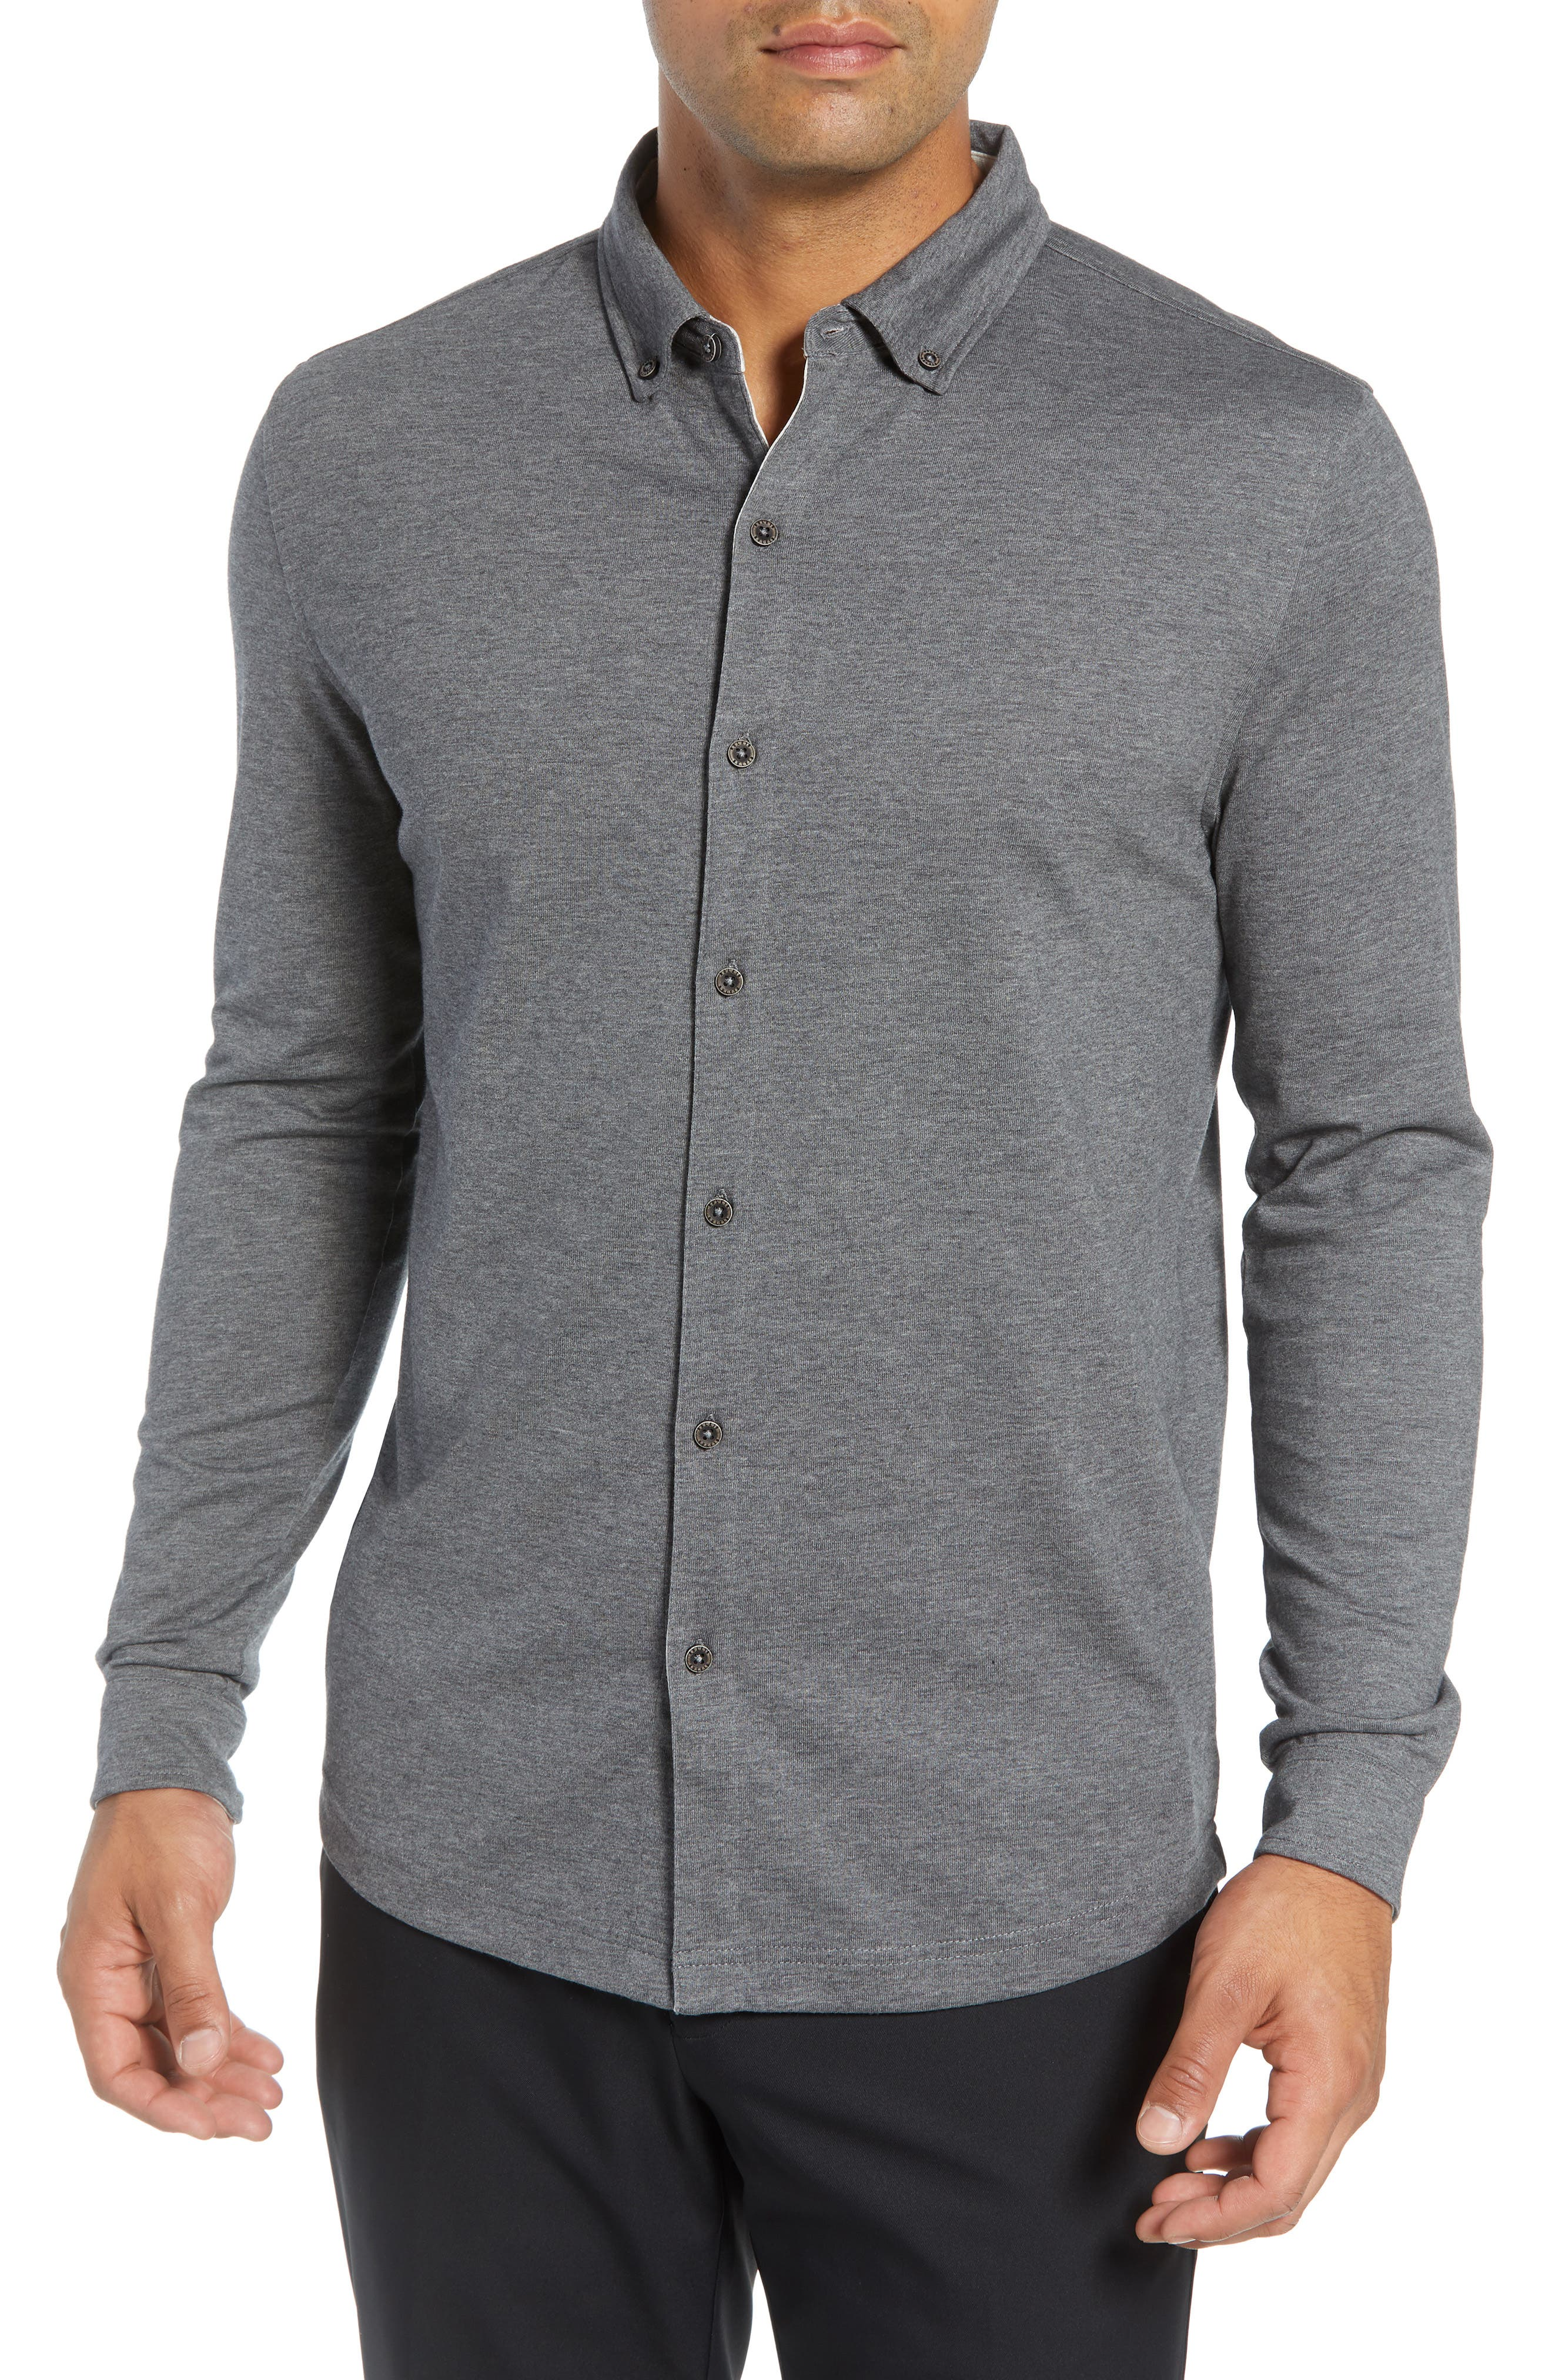 Rule 18 Brushed Regular Fit Knit Sport Shirt,                             Main thumbnail 1, color,                             020